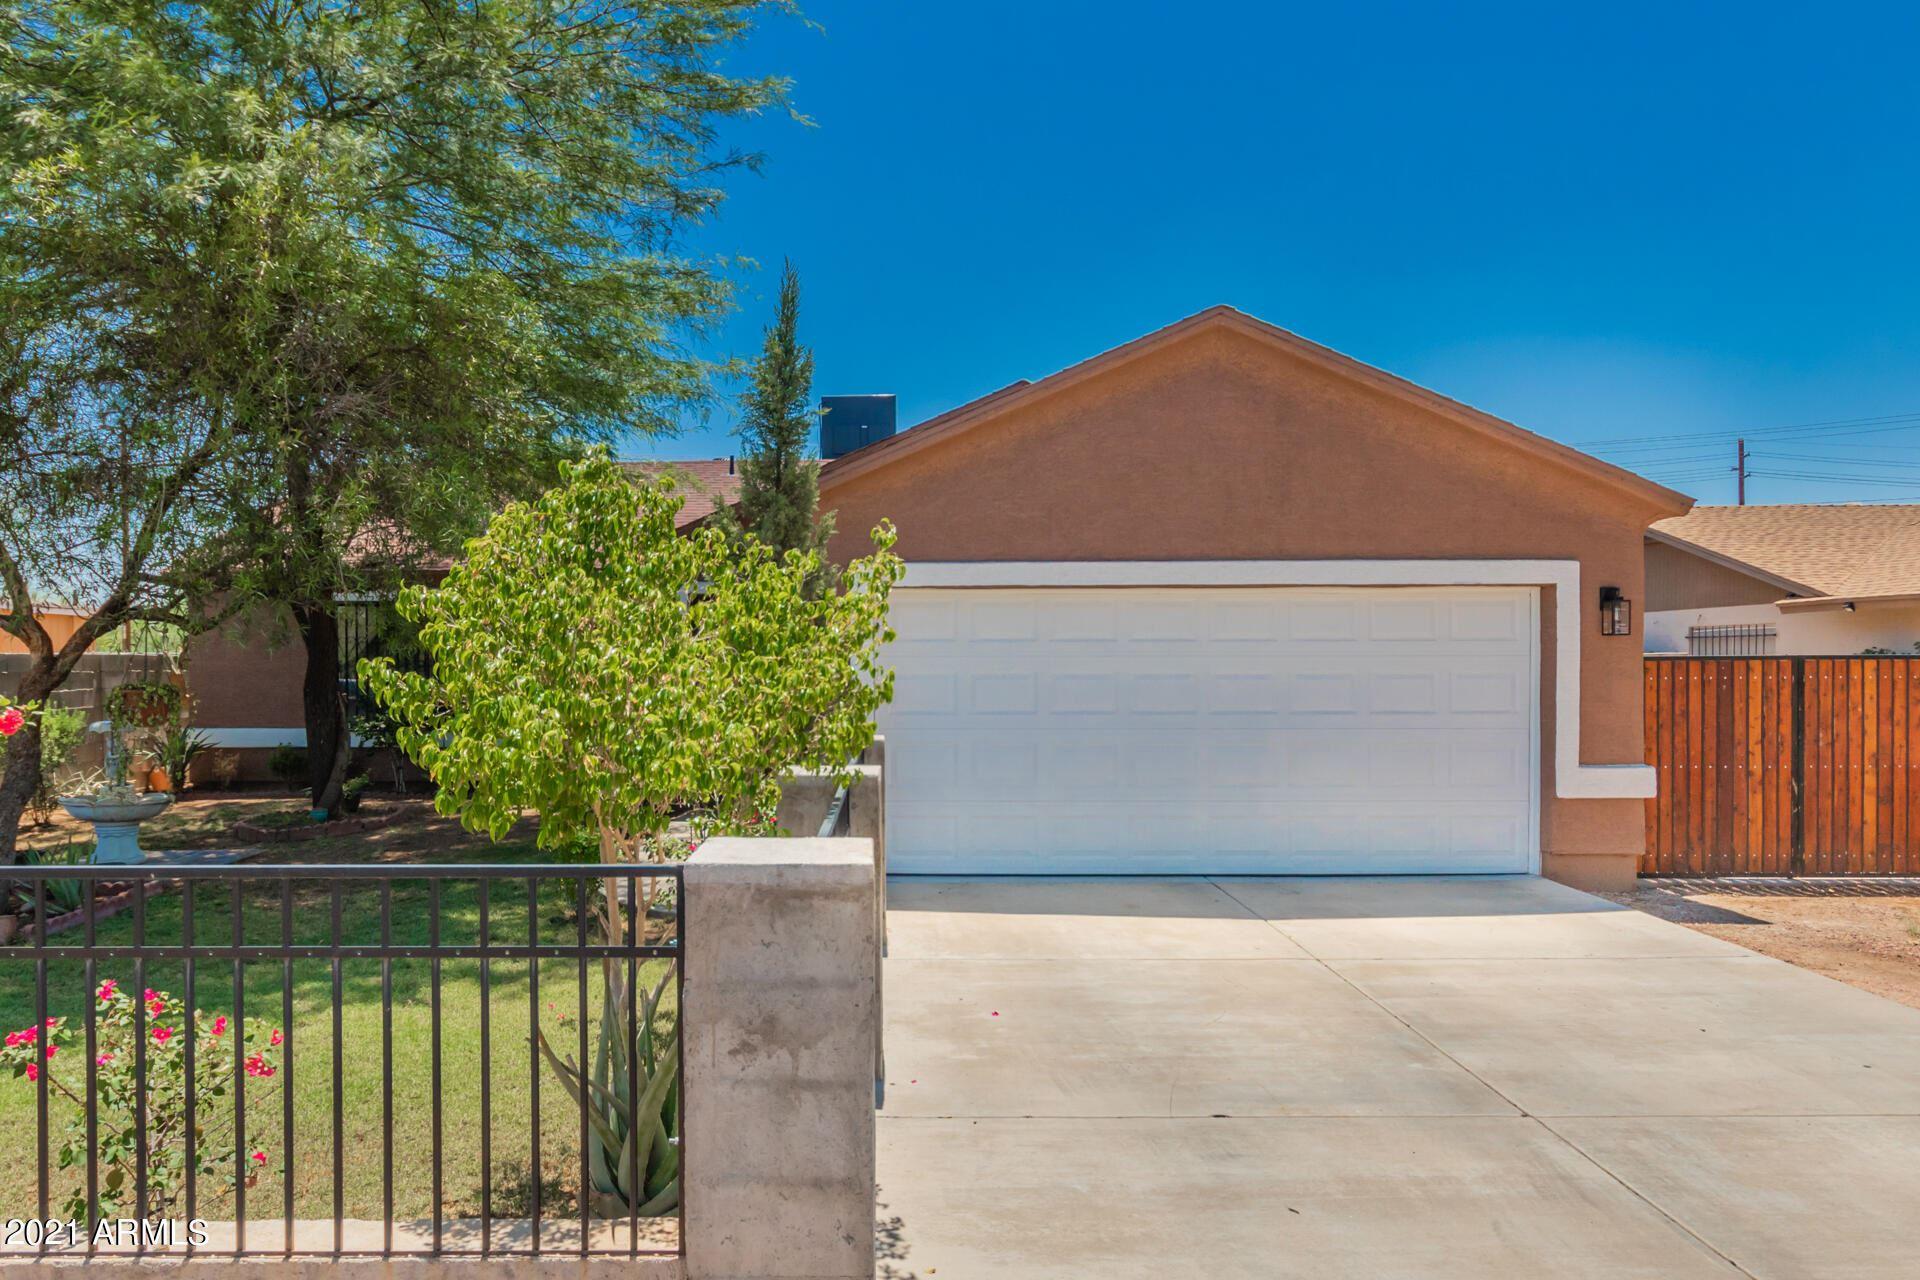 2559 E ATLANTA Avenue, Phoenix, AZ 85040 - MLS#: 6270618